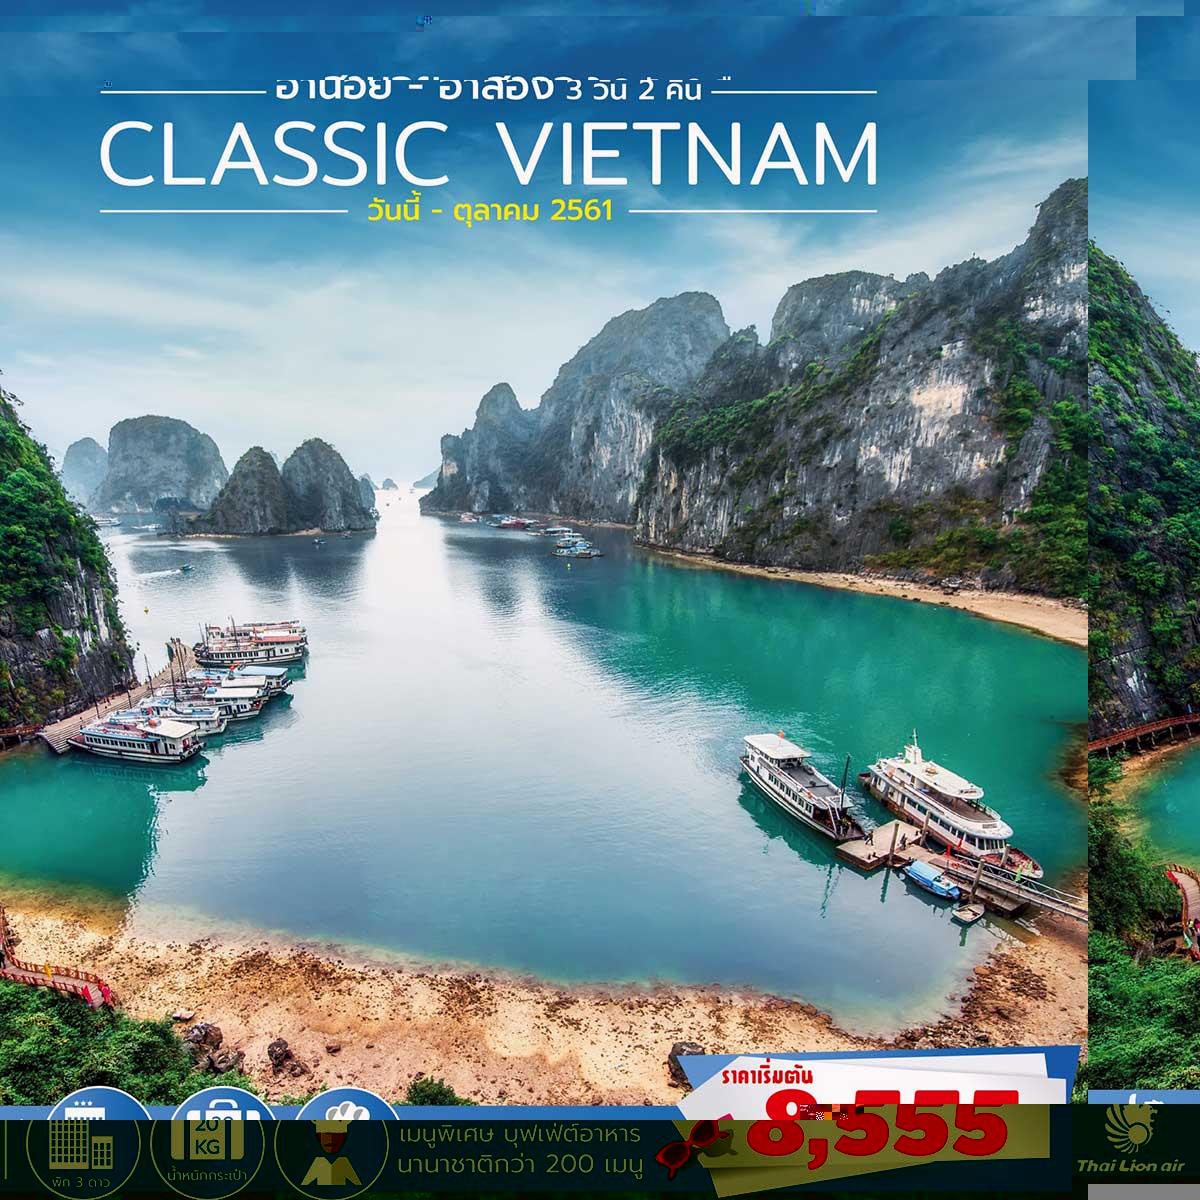 CLASSIC VIETNAM ฮานอย ฮาลอง (SL) 3D 2N